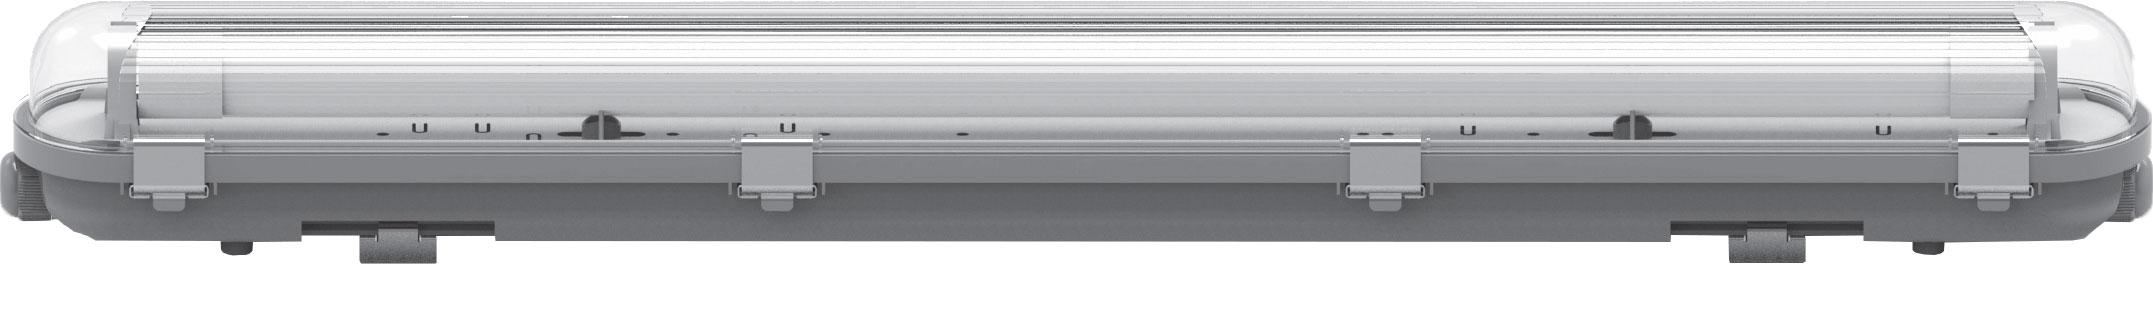 MILANO X LED DOPPIO TUBO POLICARBONATO  1200MM (2X36) IMPERIA